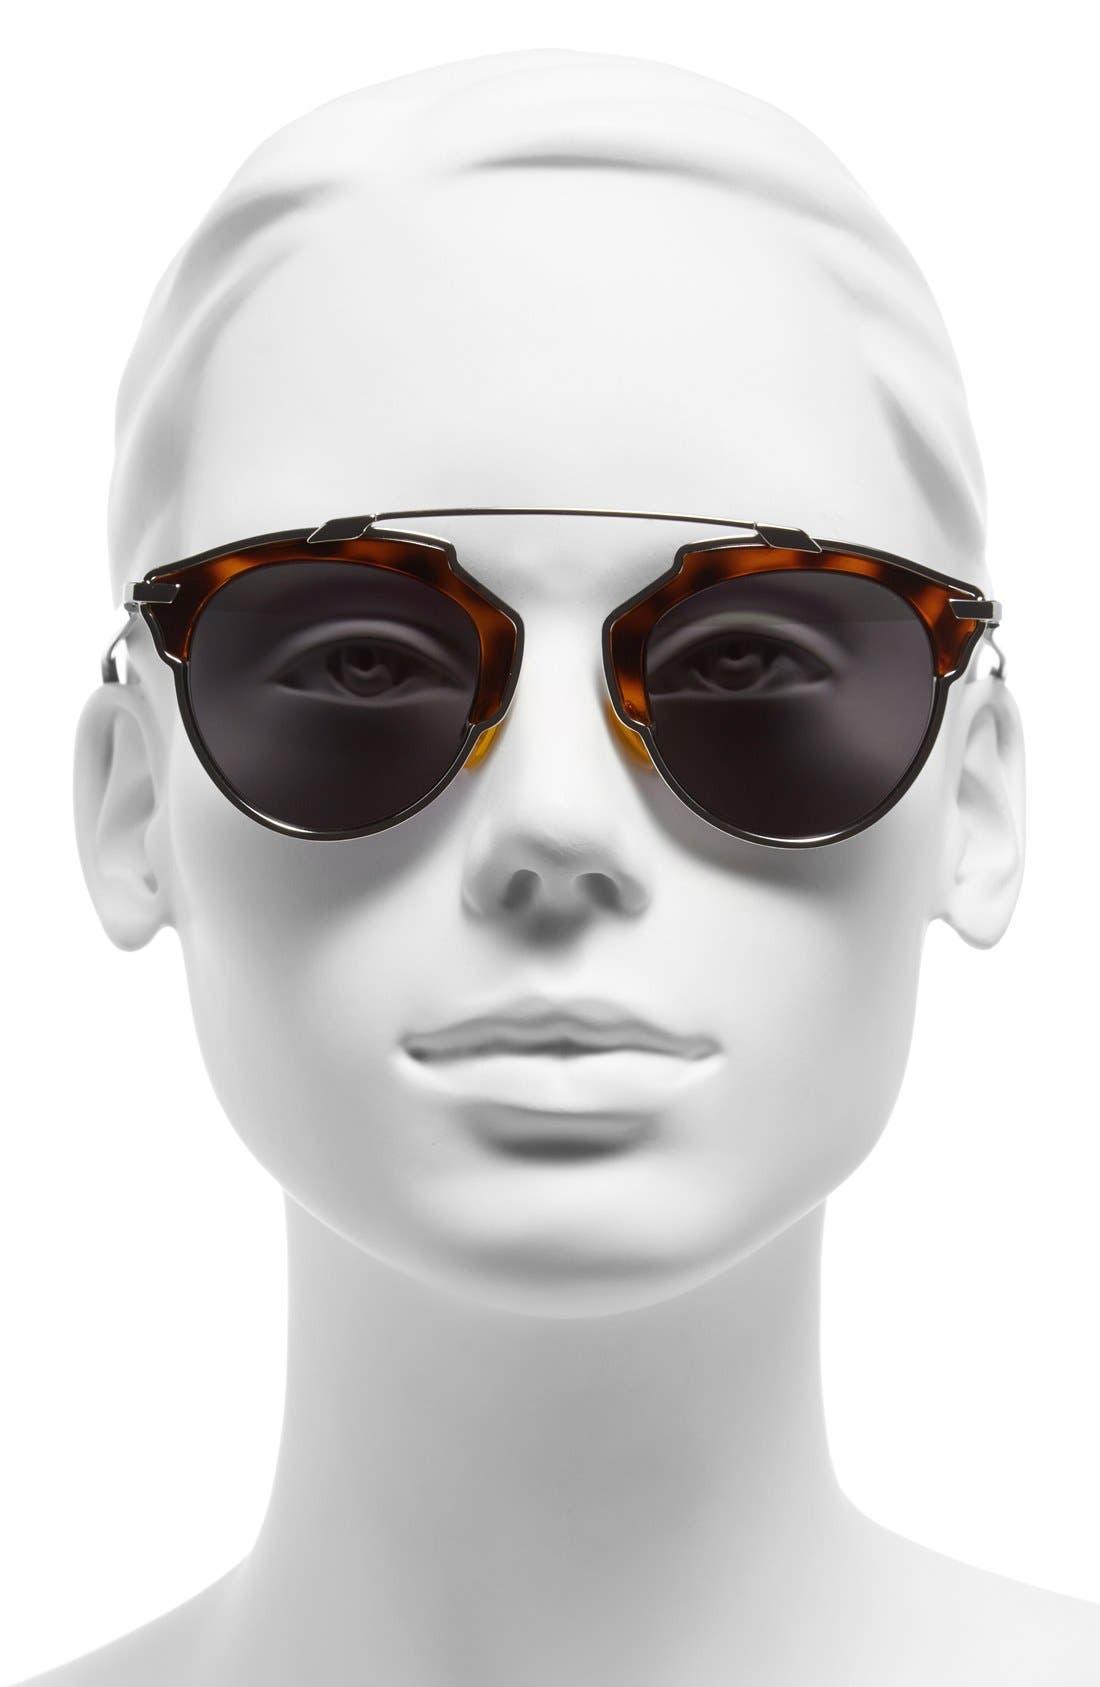 So Real 48mm Brow Bar Sunglasses,                             Alternate thumbnail 36, color,